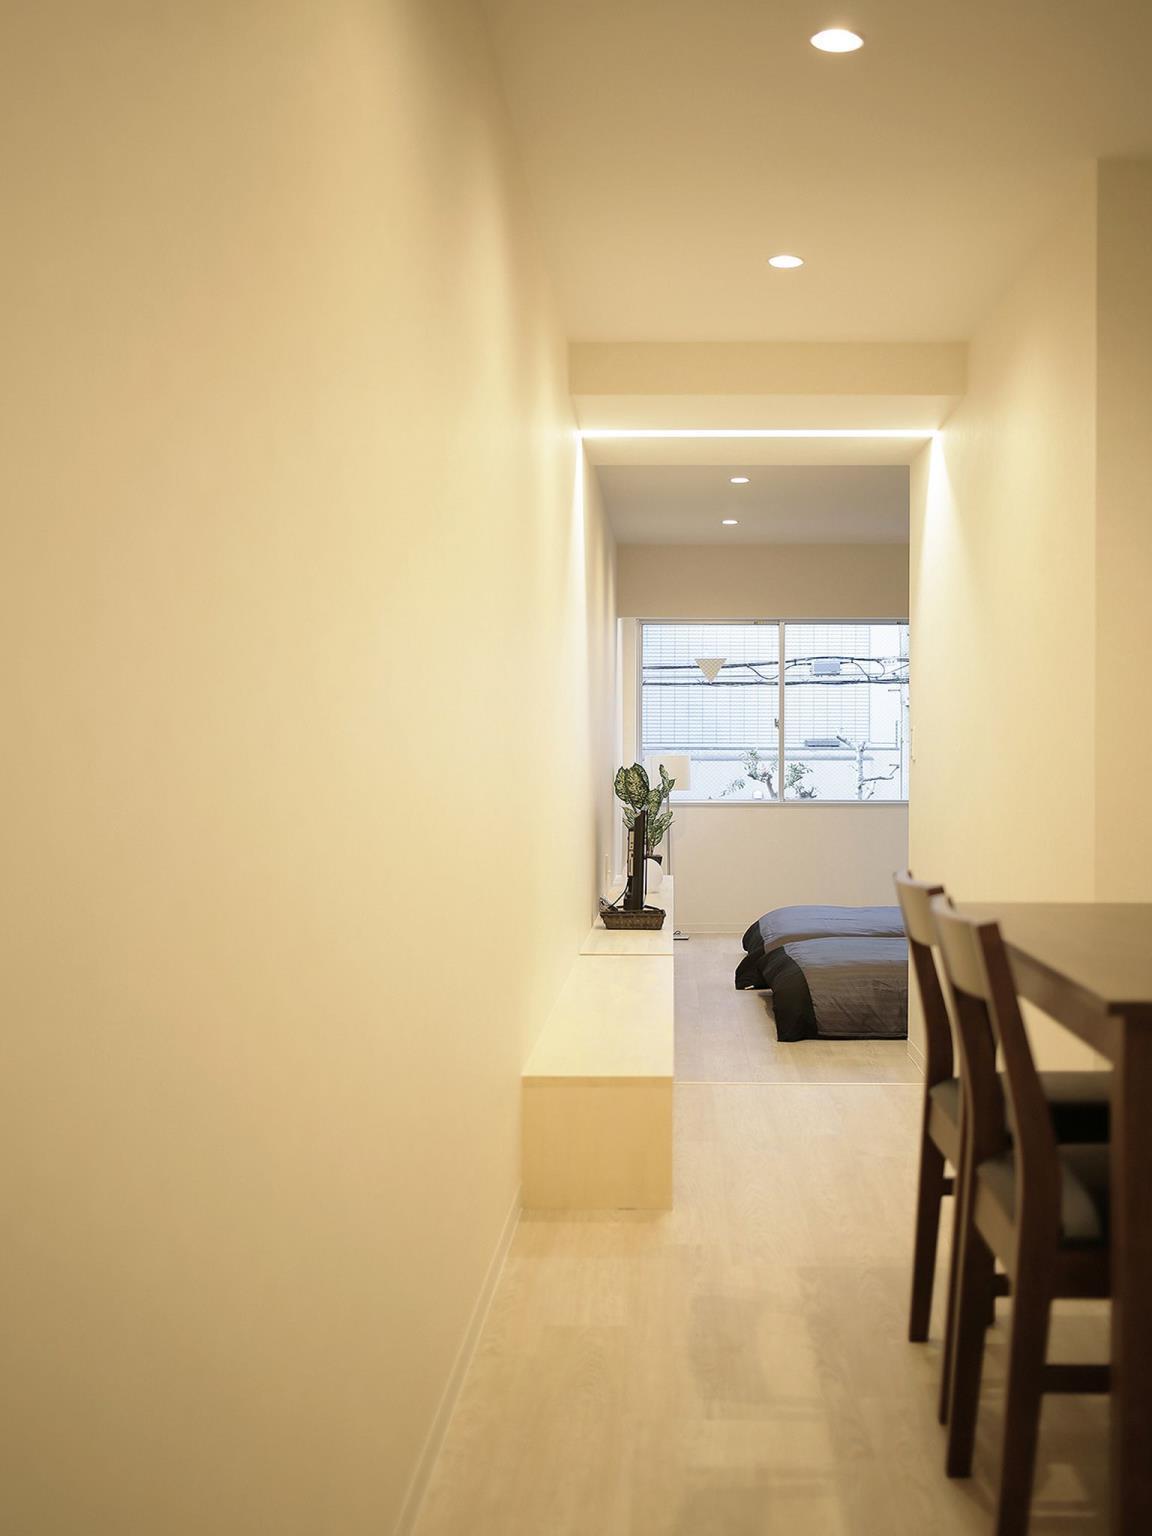 Namba Echizen Apartment 202 Osaka Japan